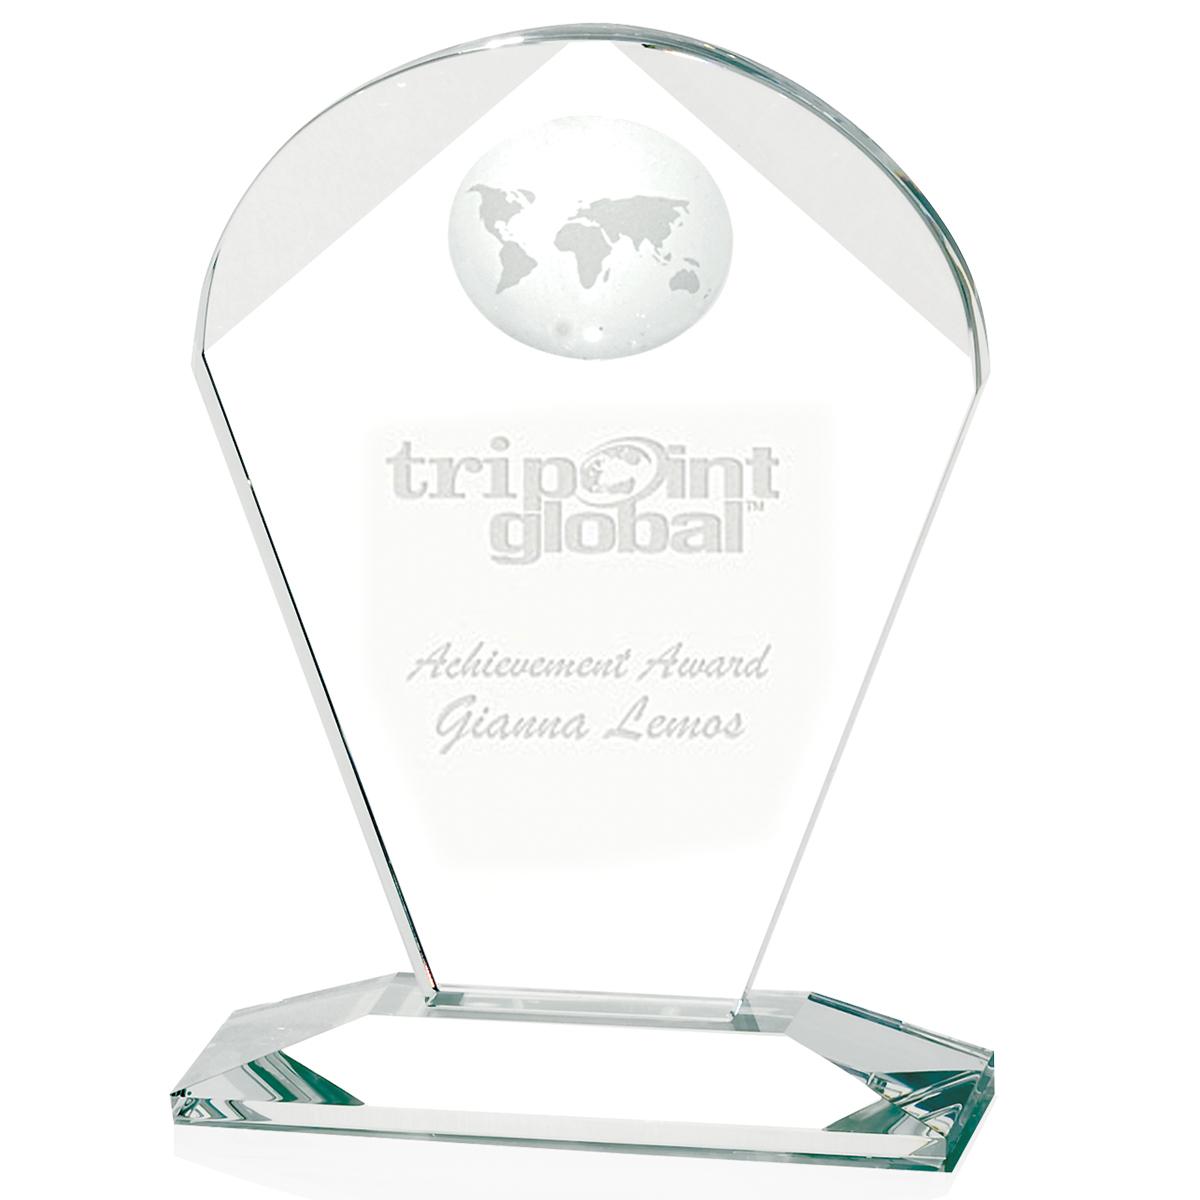 Jaffa Geodesic Small Award - Deep Etch Imprint